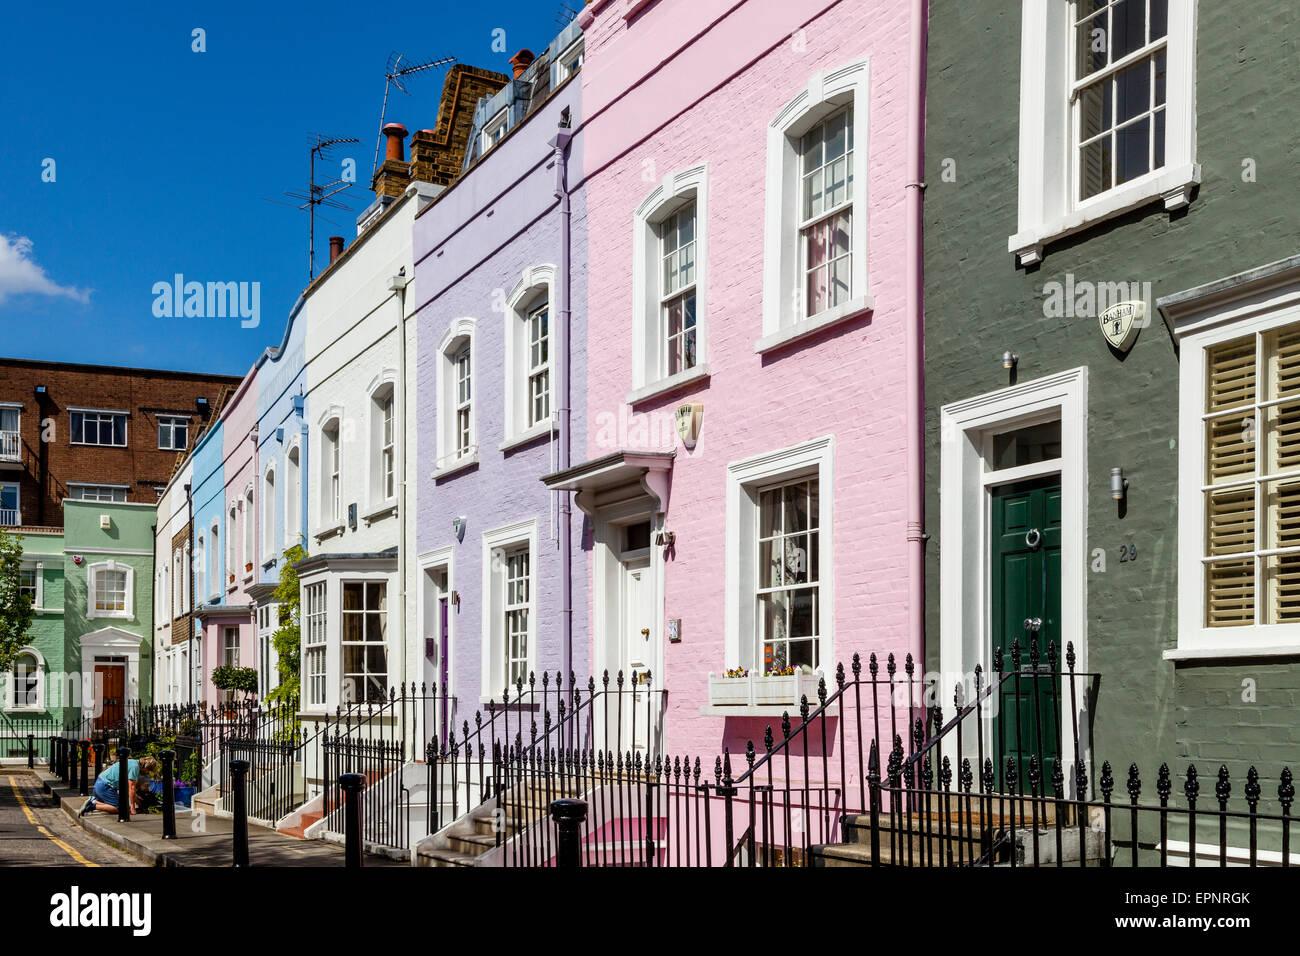 bunte h user von k nig der stra e chelsea london england stockfoto bild 82843395 alamy. Black Bedroom Furniture Sets. Home Design Ideas